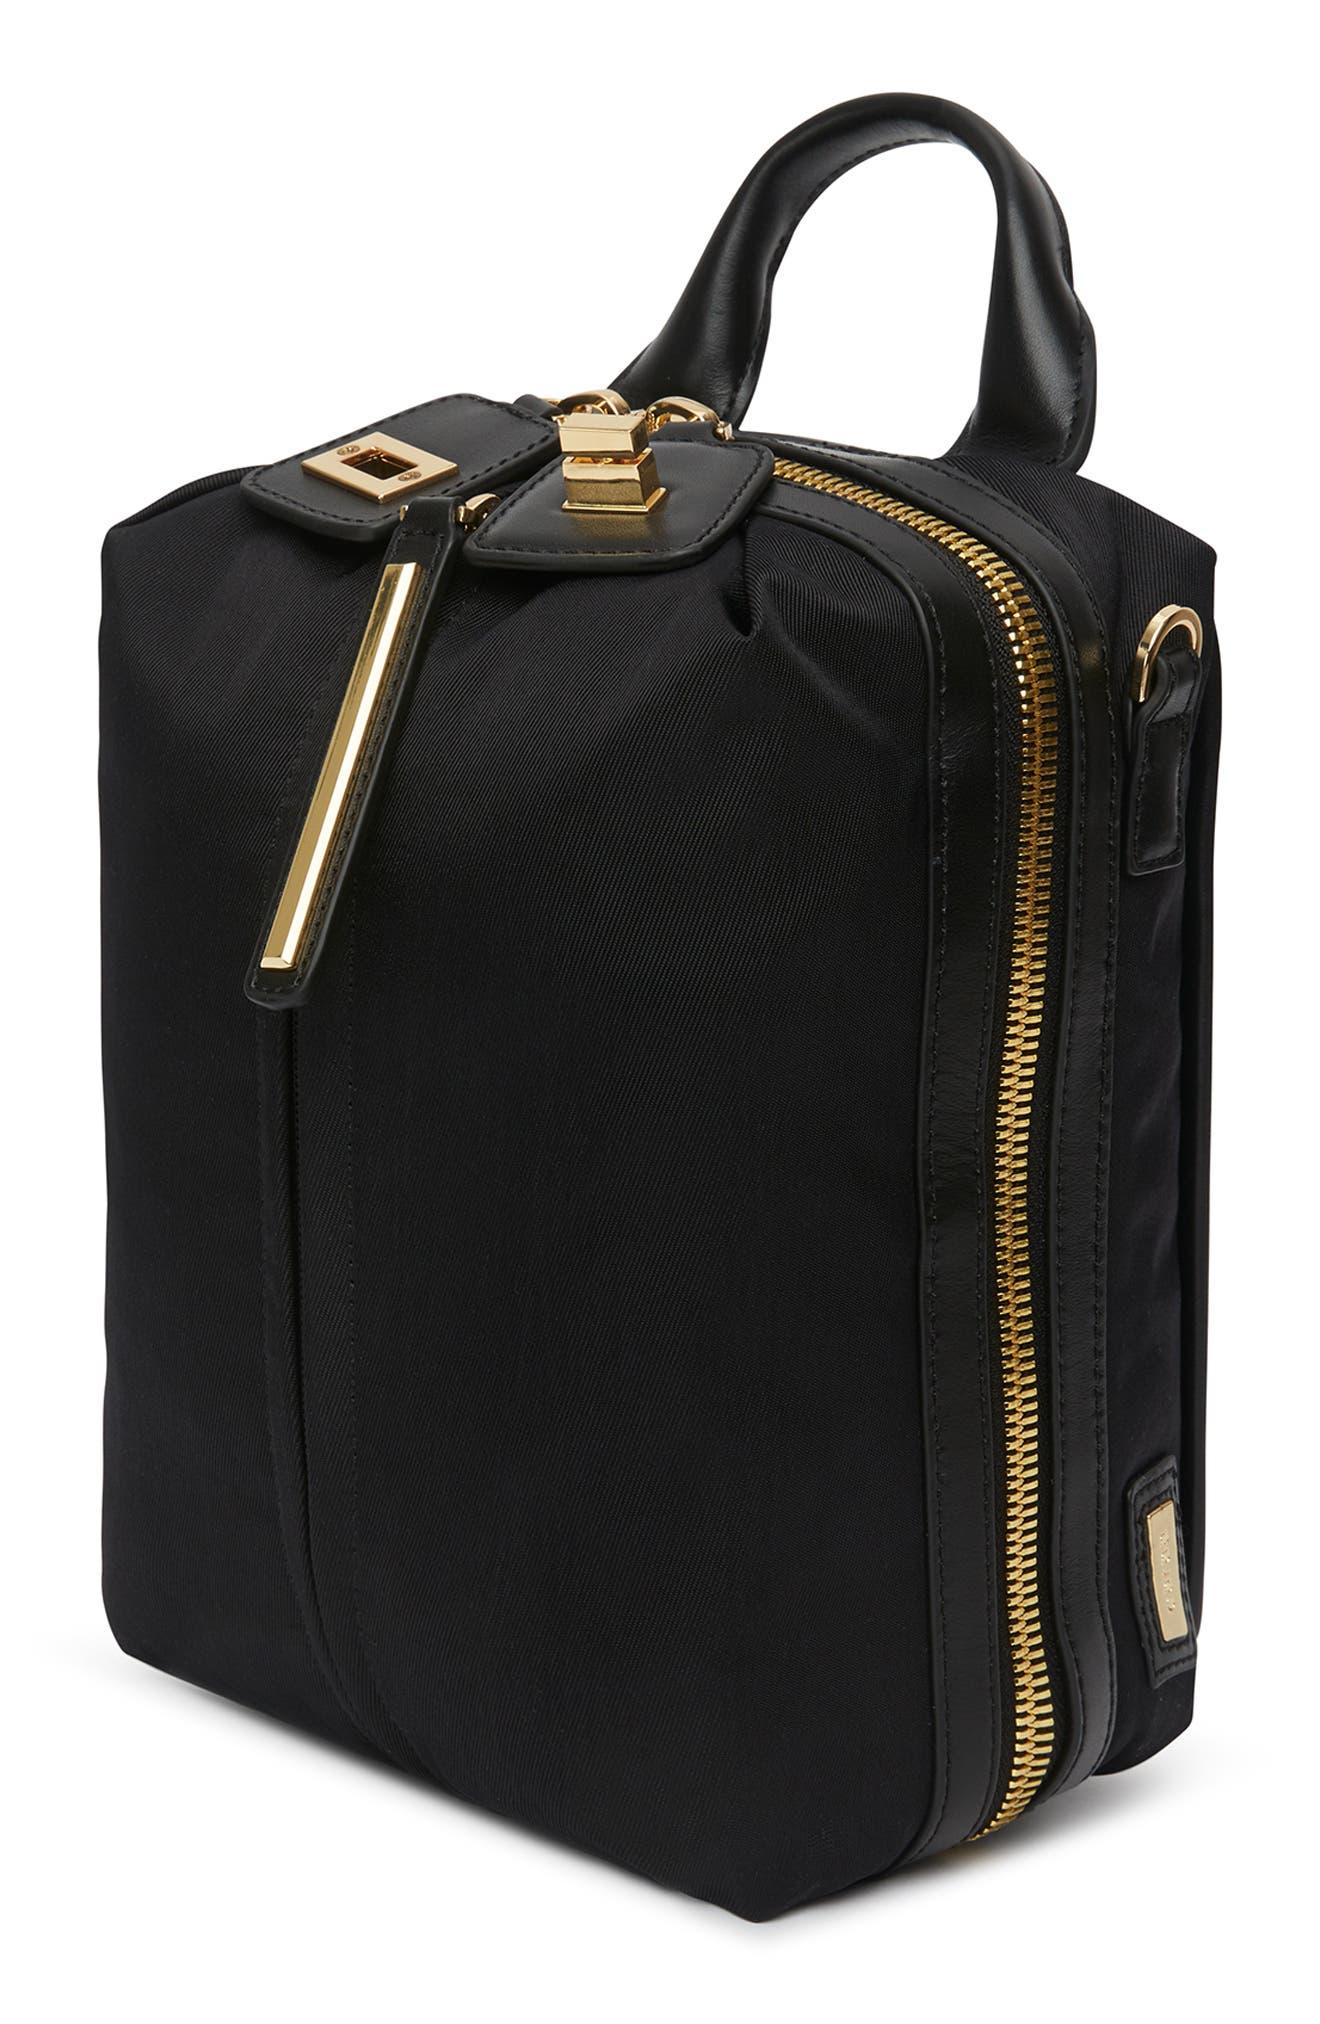 Studio 2 Mini Duffel Bag,                             Alternate thumbnail 4, color,                             BLACK GOLD